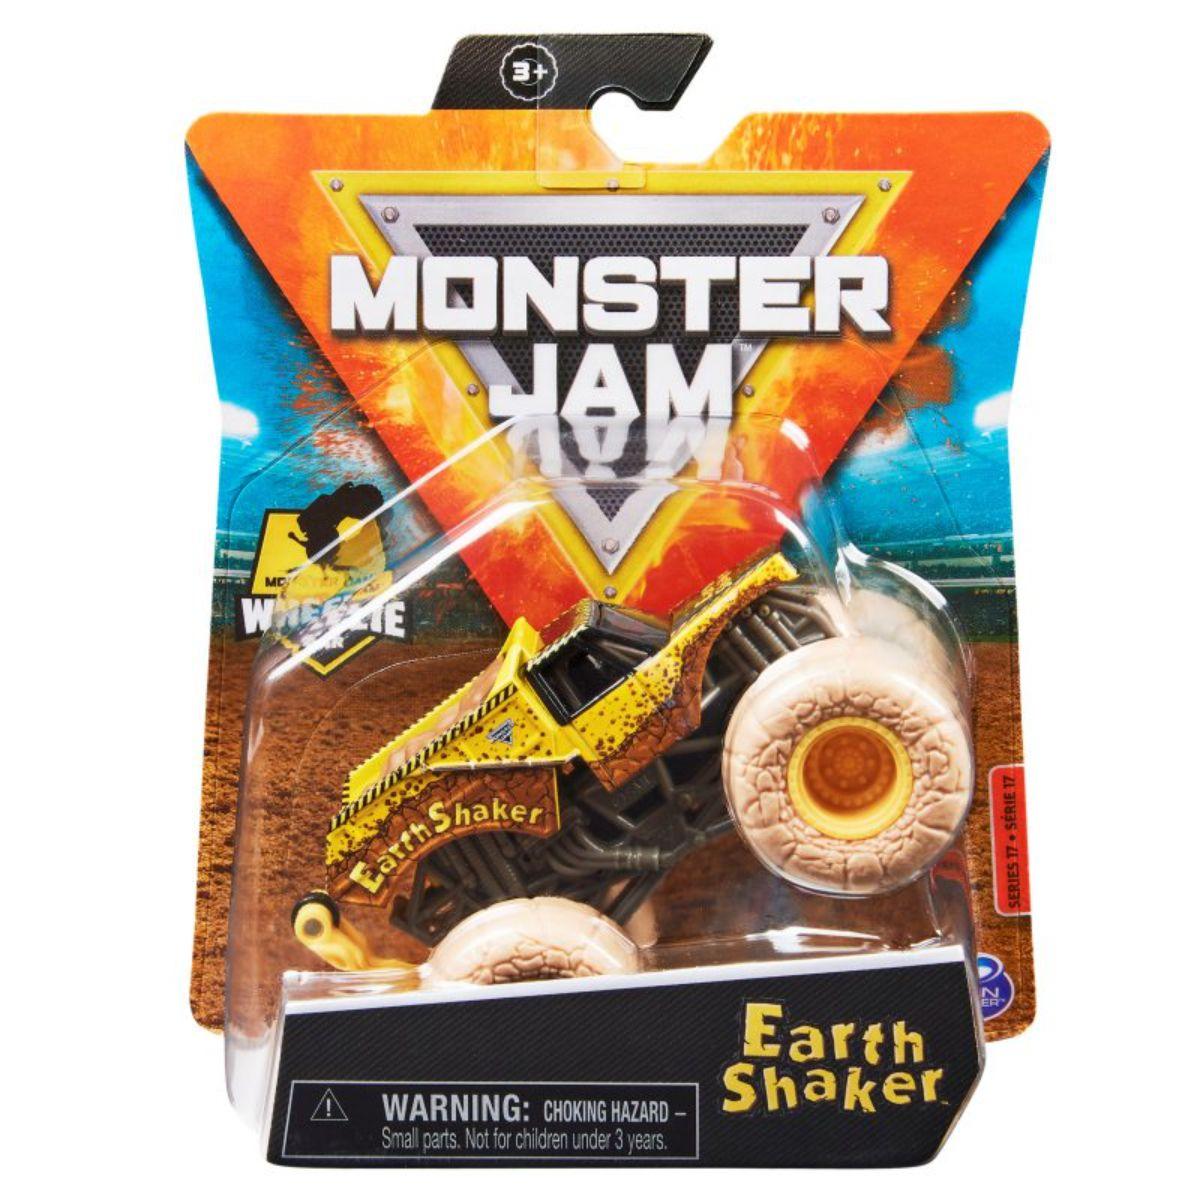 Masinuta Monster Jam, Scara 1:64, Earth Shaker, 20130579